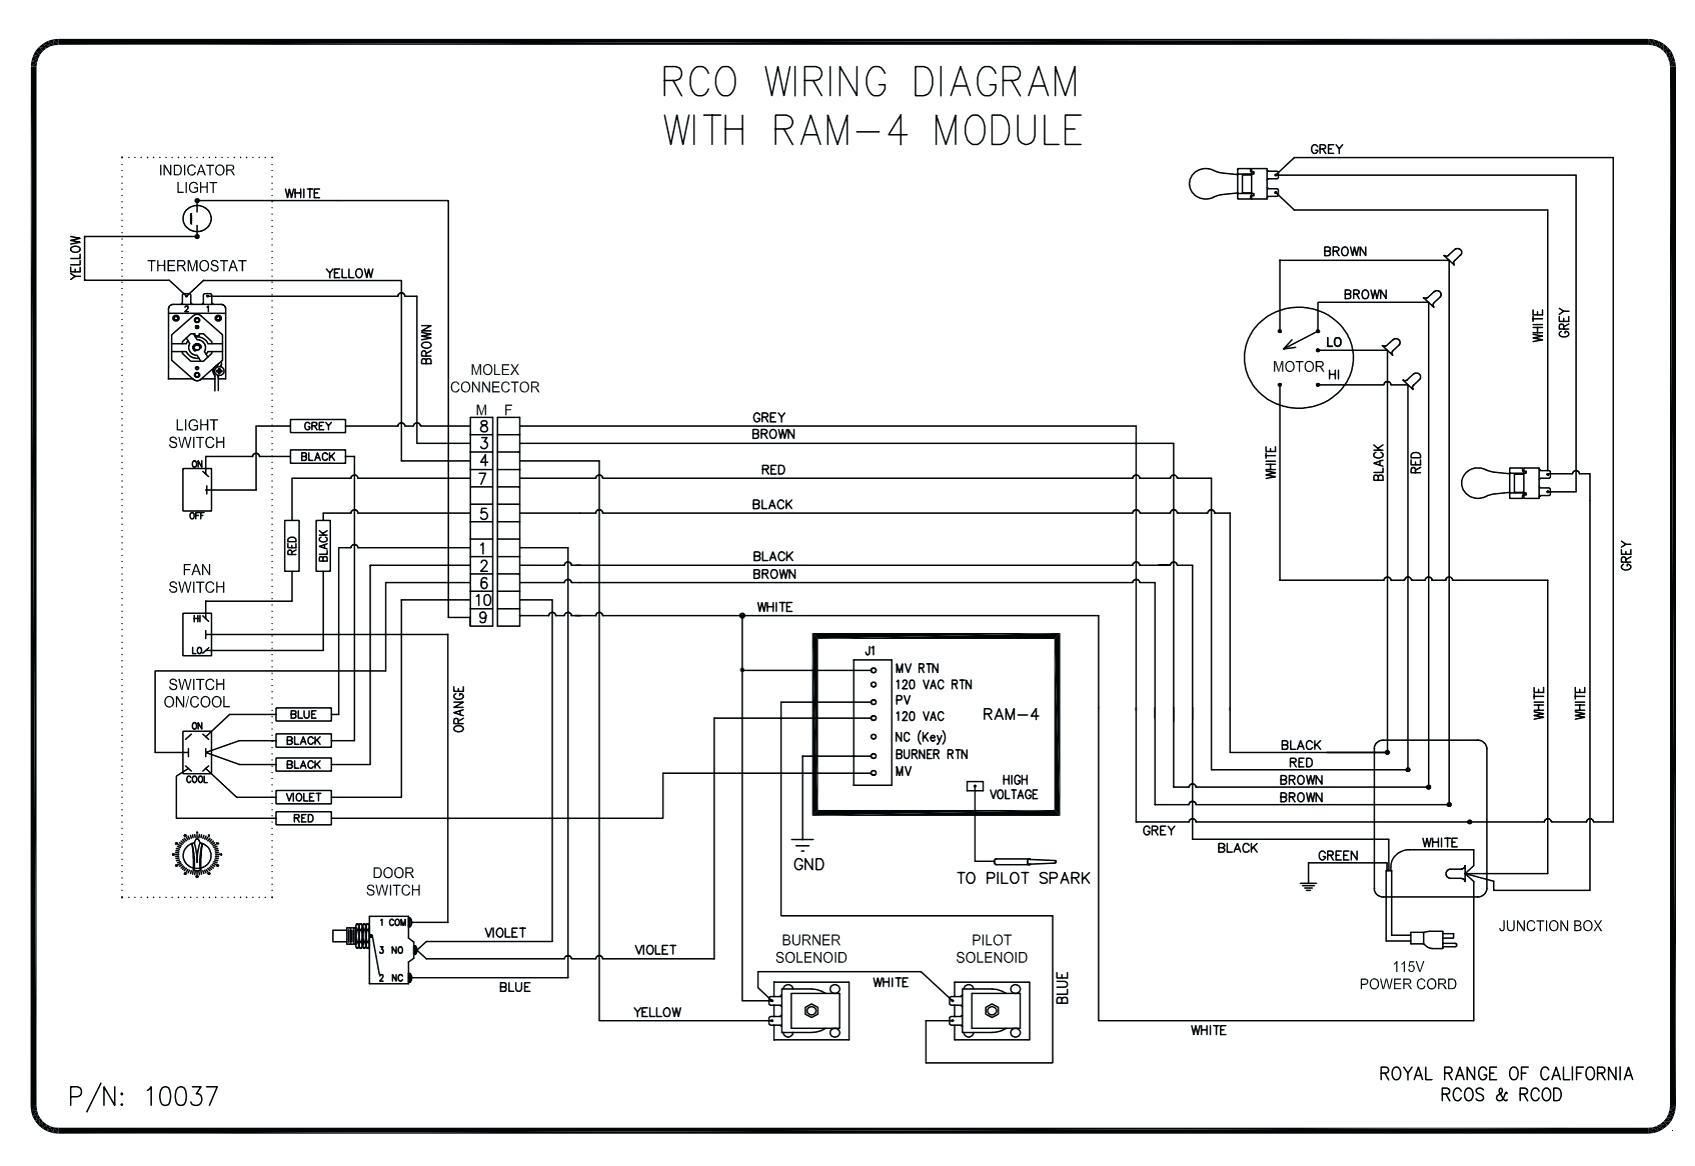 24 Wiring Diagram For Electric Stove Diagram Diagram Design